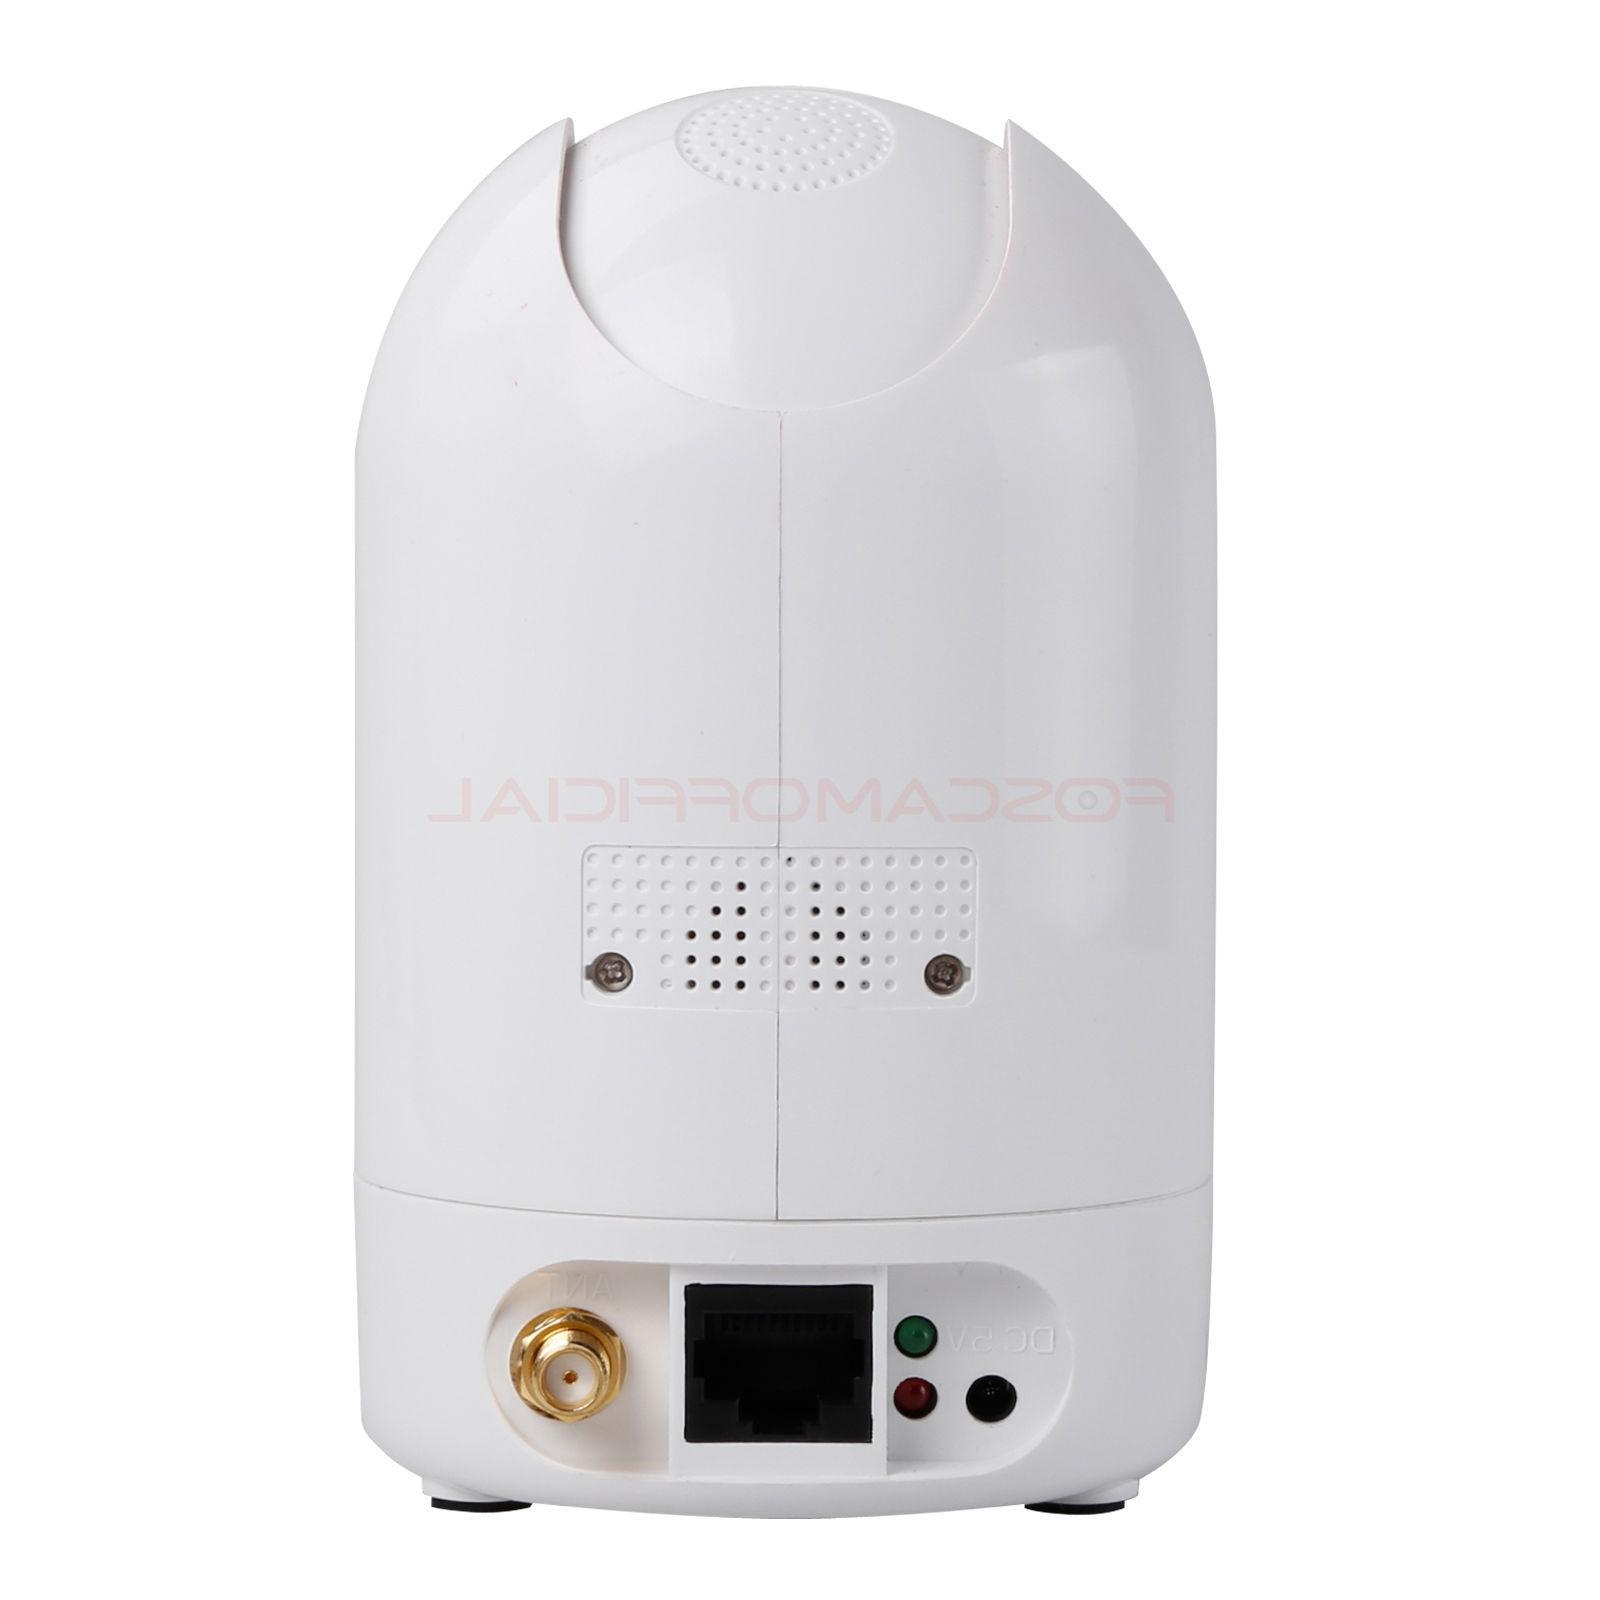 Foscam 1440P Pan Zoom Wireless Security IP Cameras